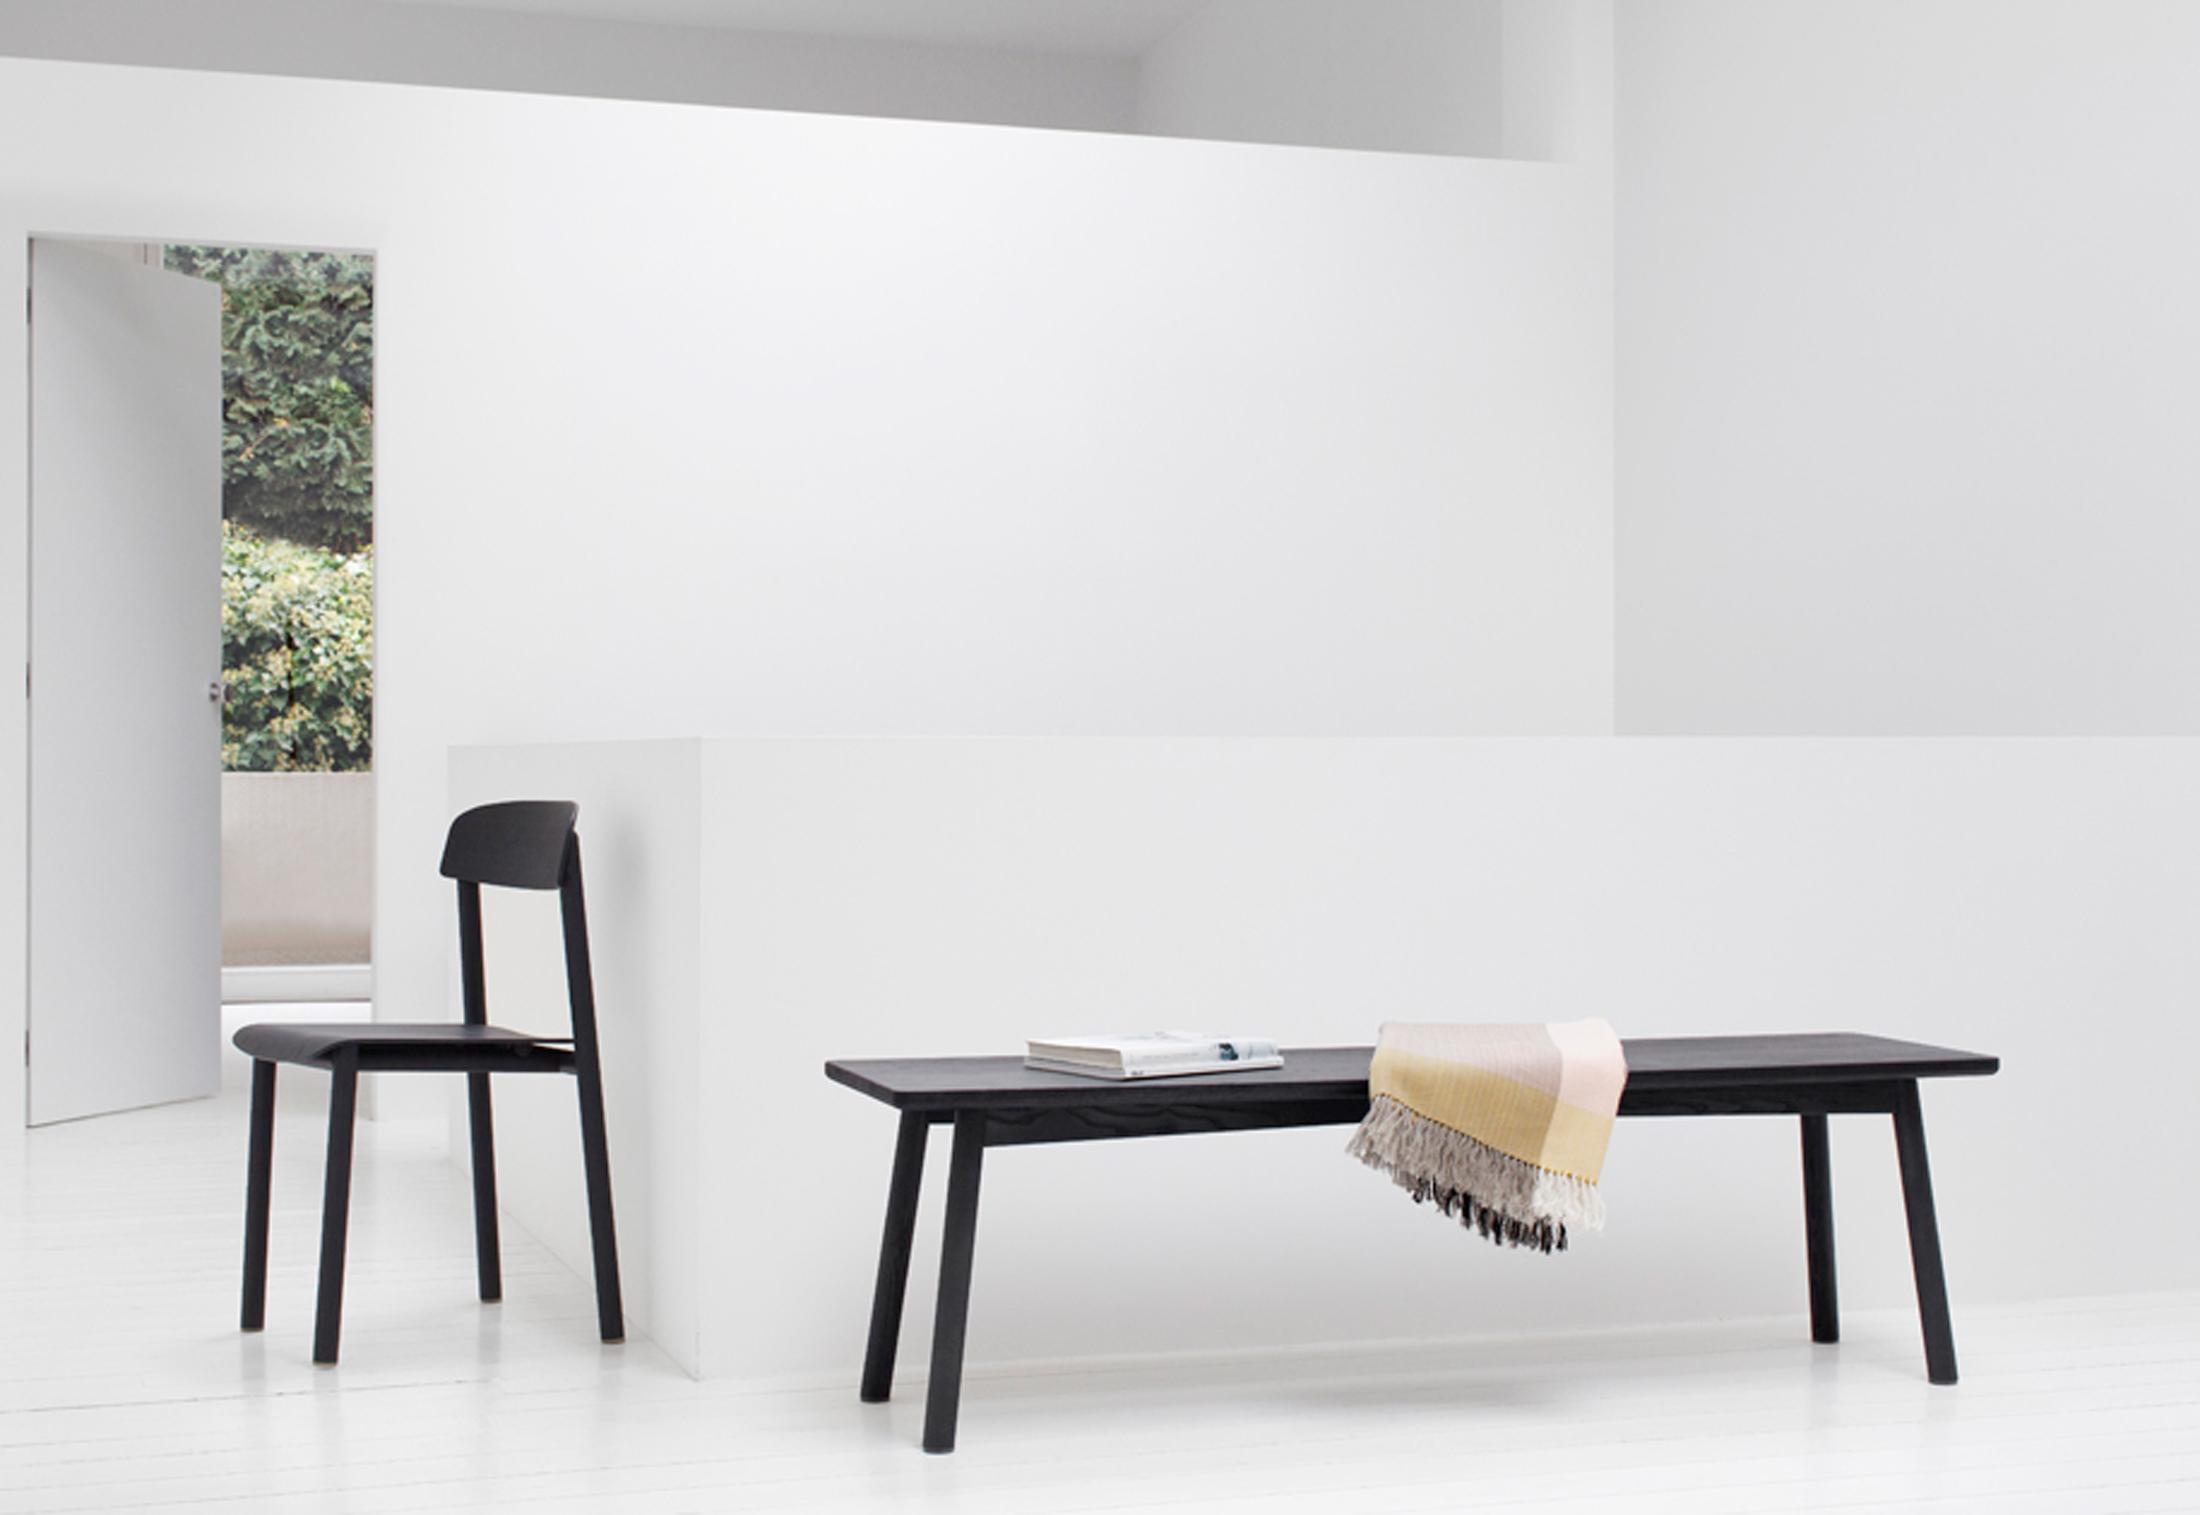 profile bench by stattmann neue moebel stylepark. Black Bedroom Furniture Sets. Home Design Ideas